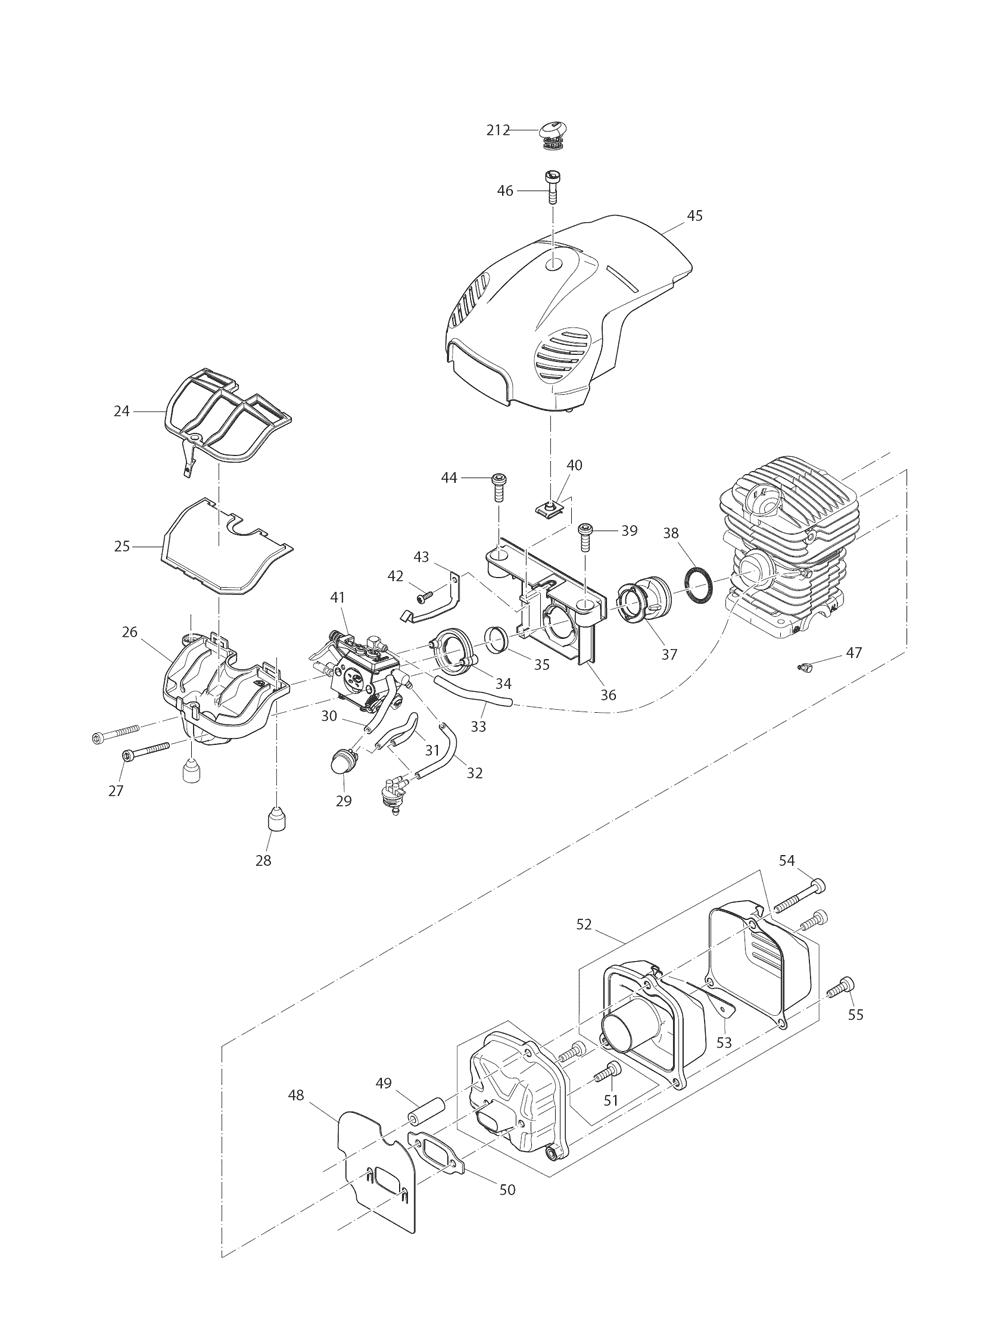 EA3201S40B-T3-Makita-PB-1Break Down